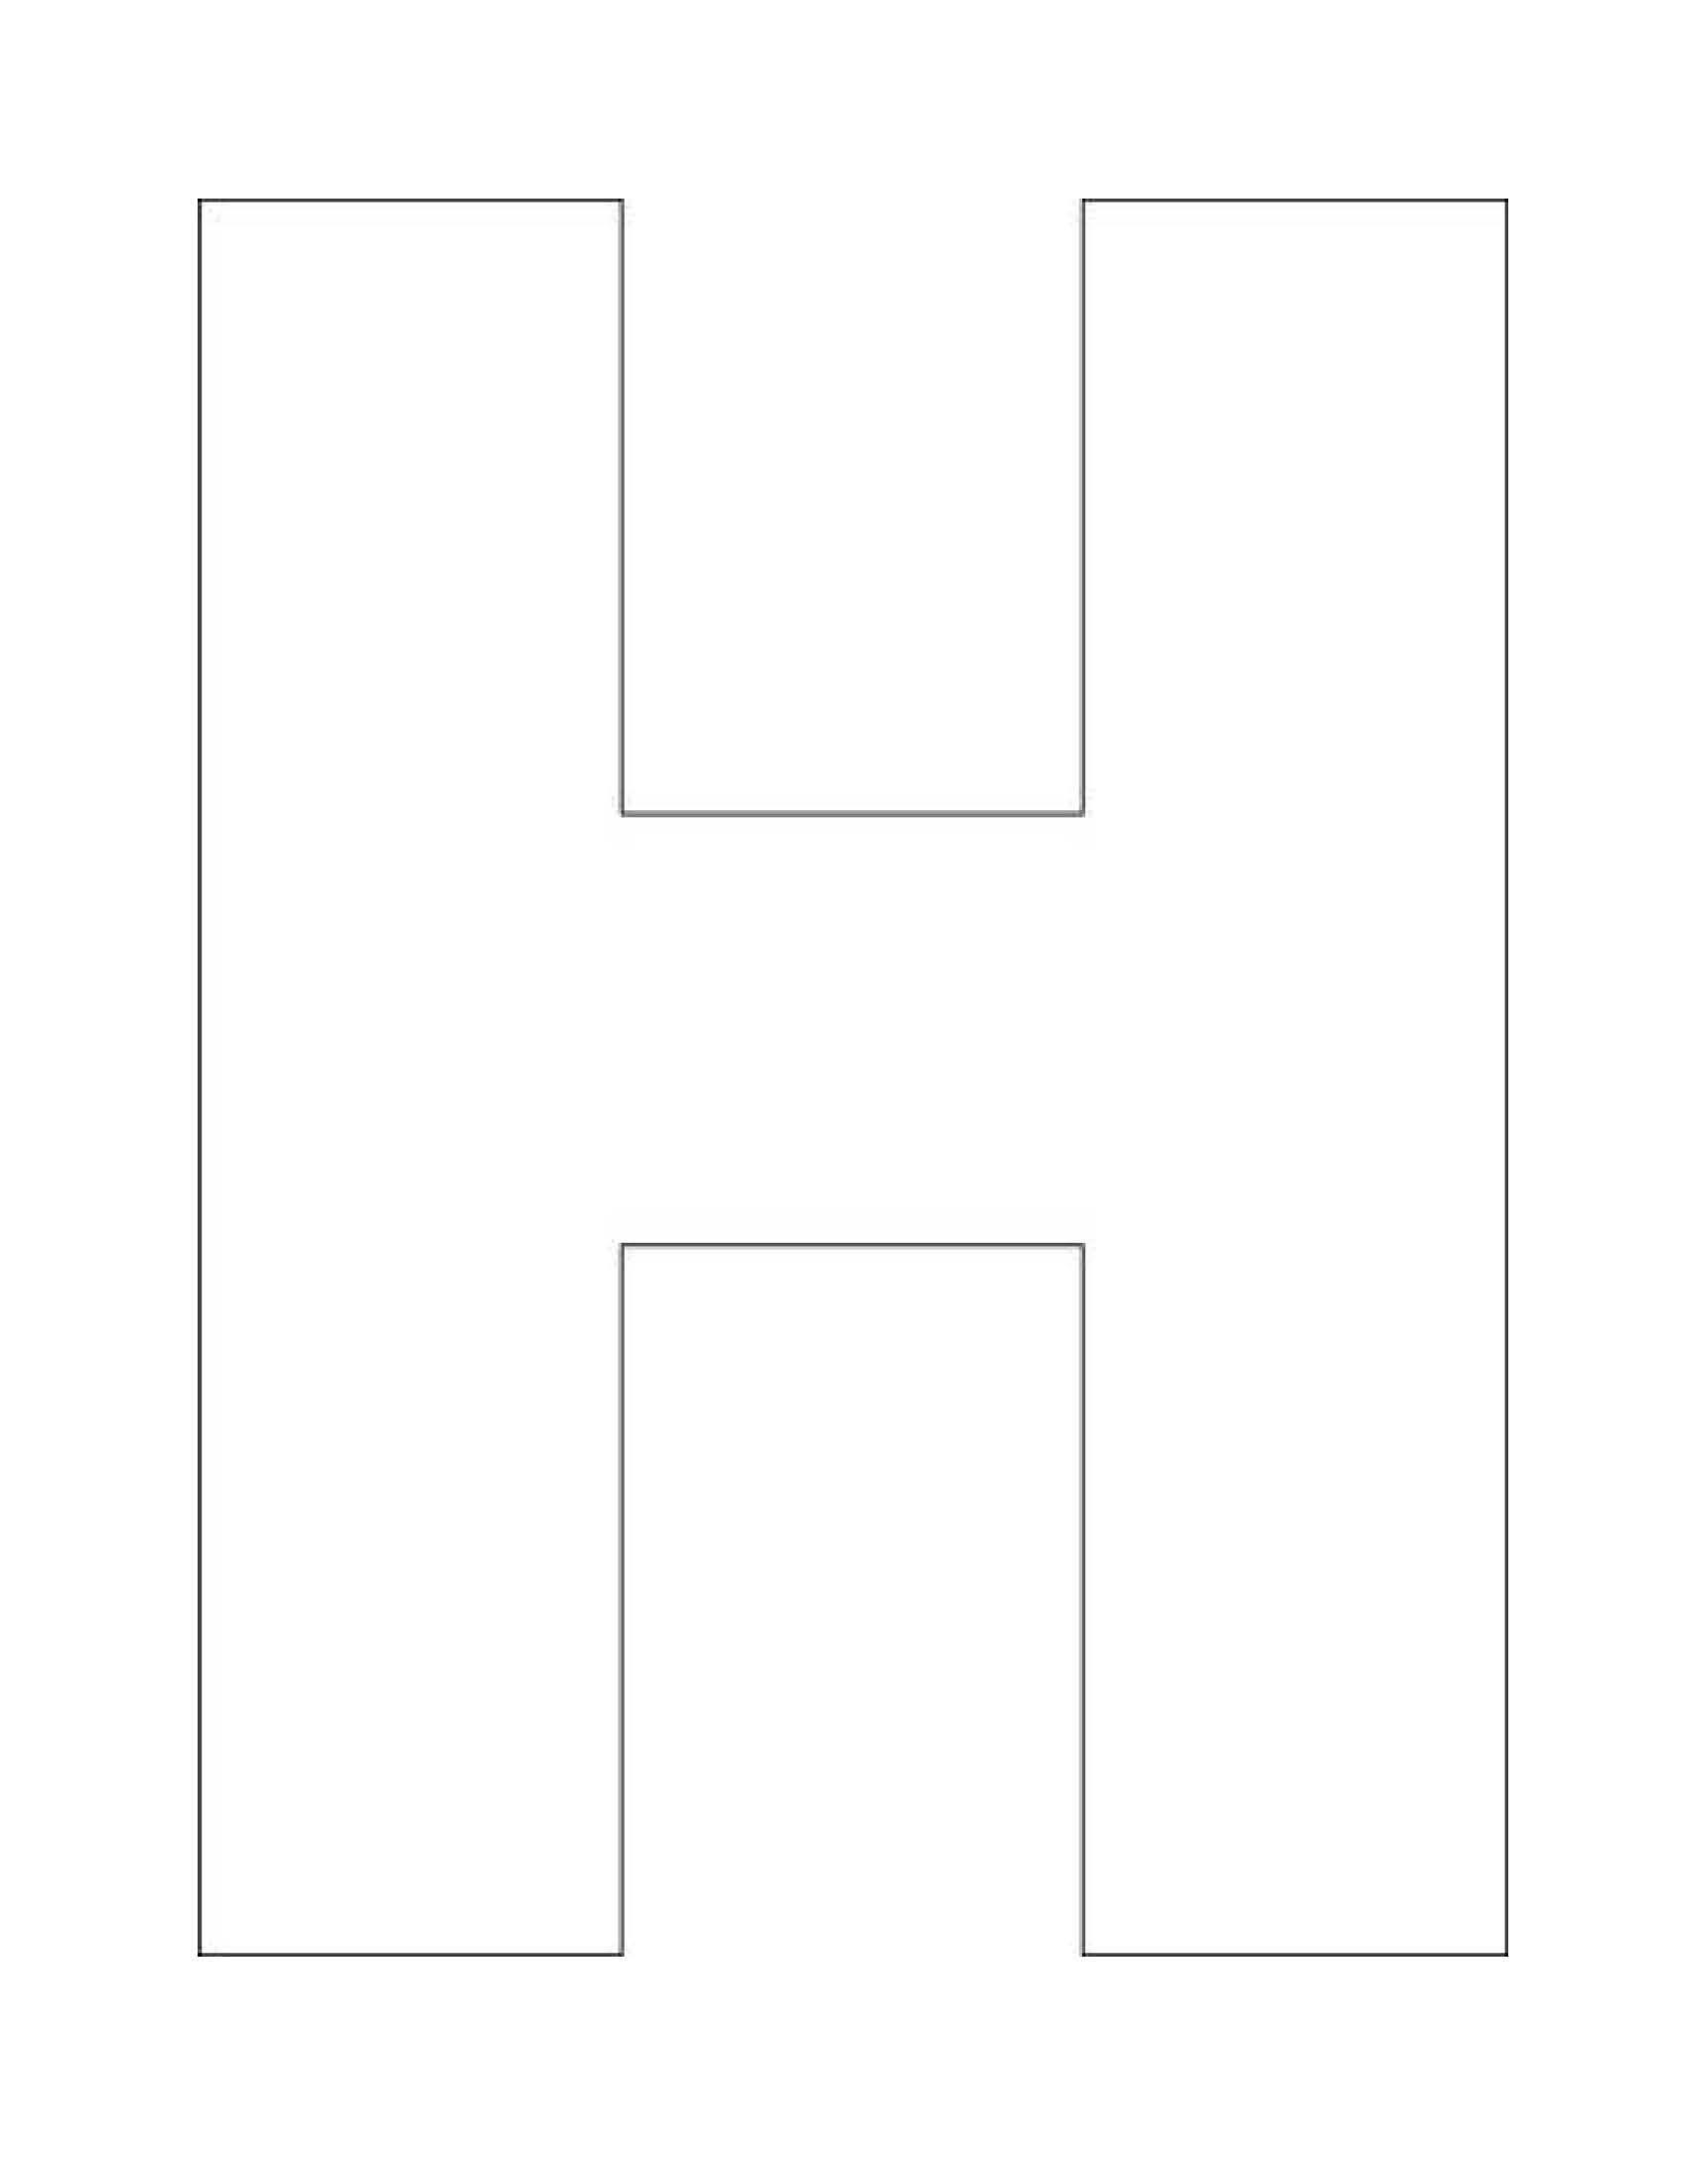 letter h template free printable  Pin en Letter H - letter h template free printable